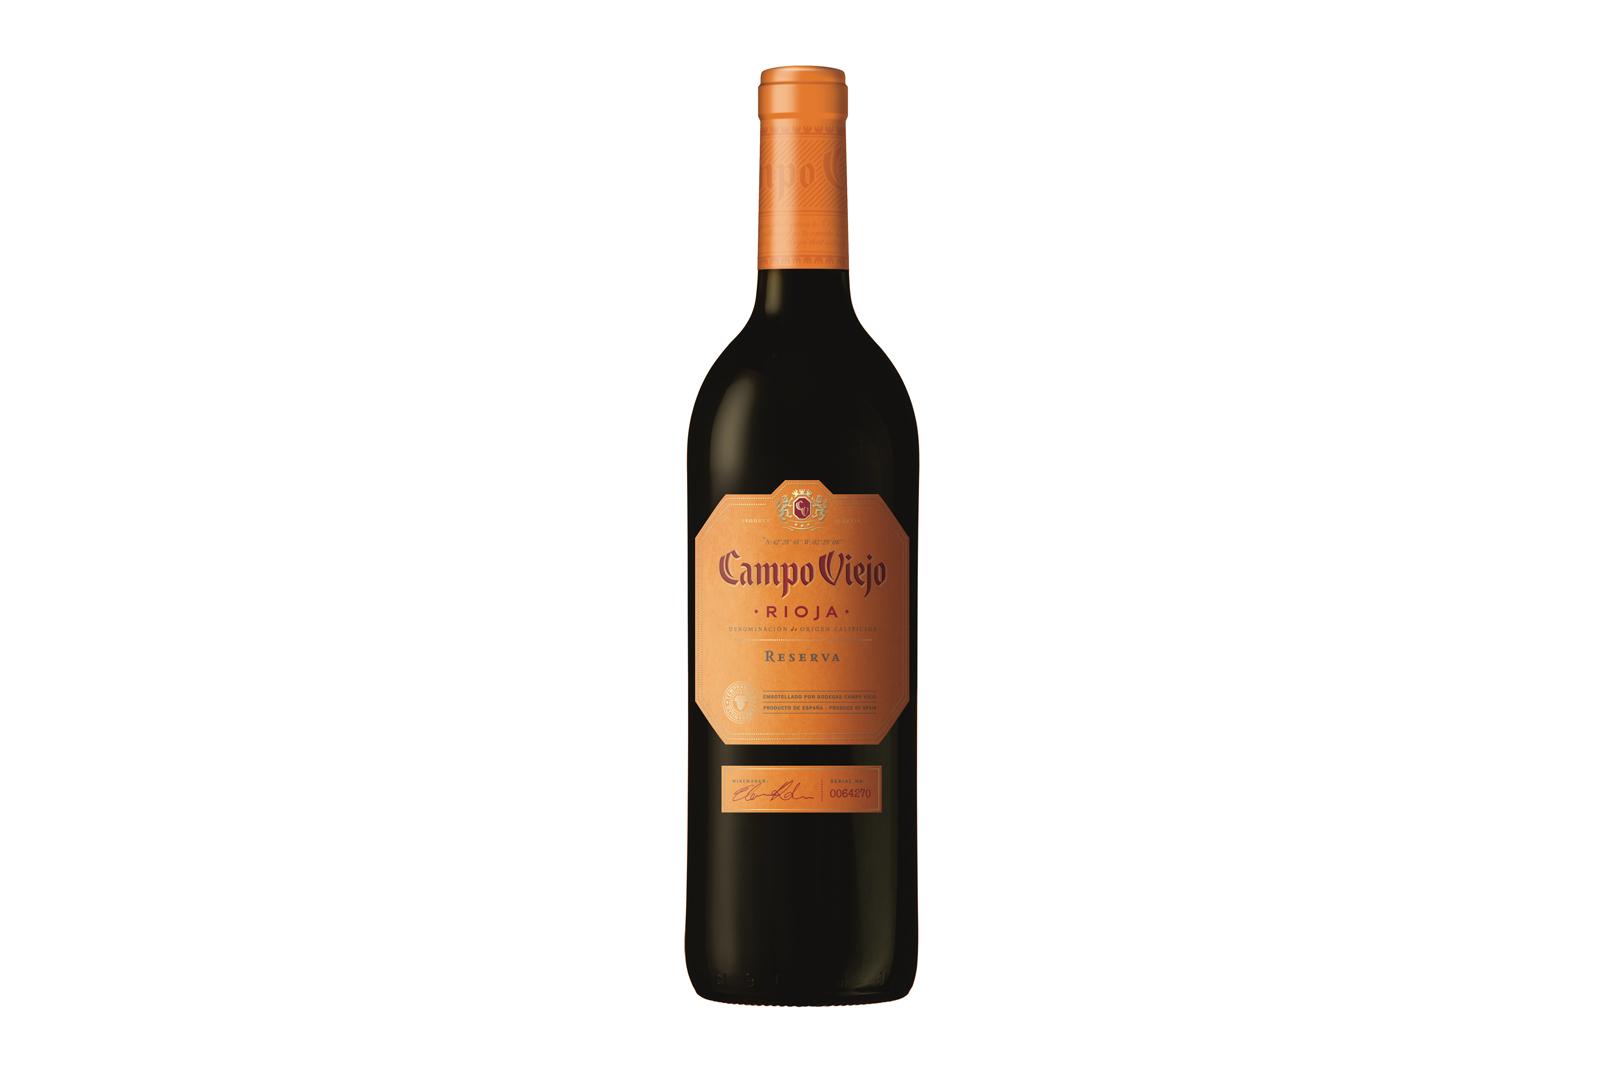 Campo Viejo Reserva 2010, 90 puntos Wine Spectator.